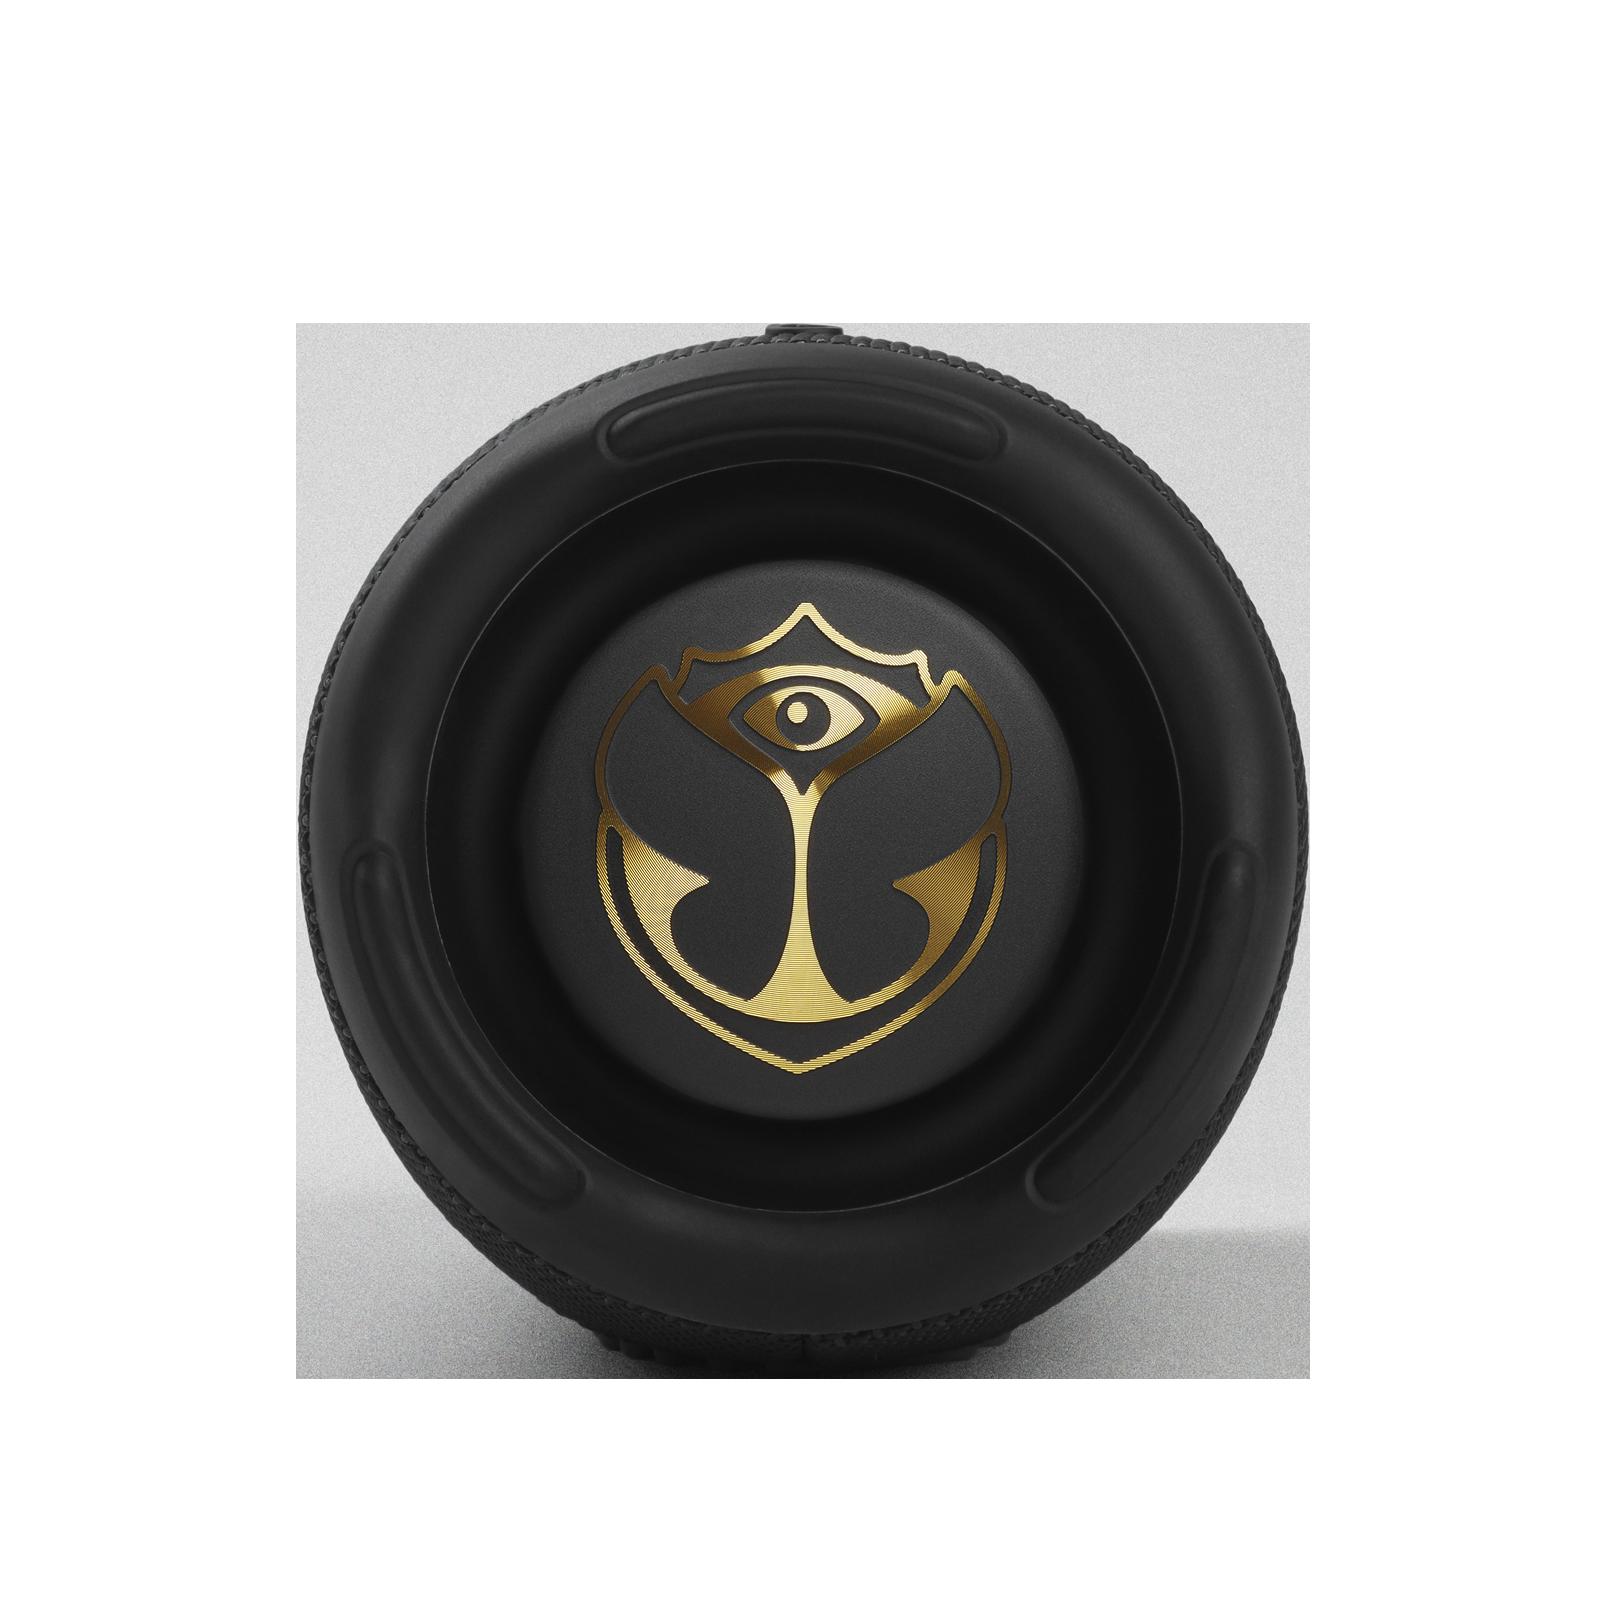 JBL Charge 5 Tomorrowland Edition - Black - Portable Waterproof Speaker with Powerbank - Left